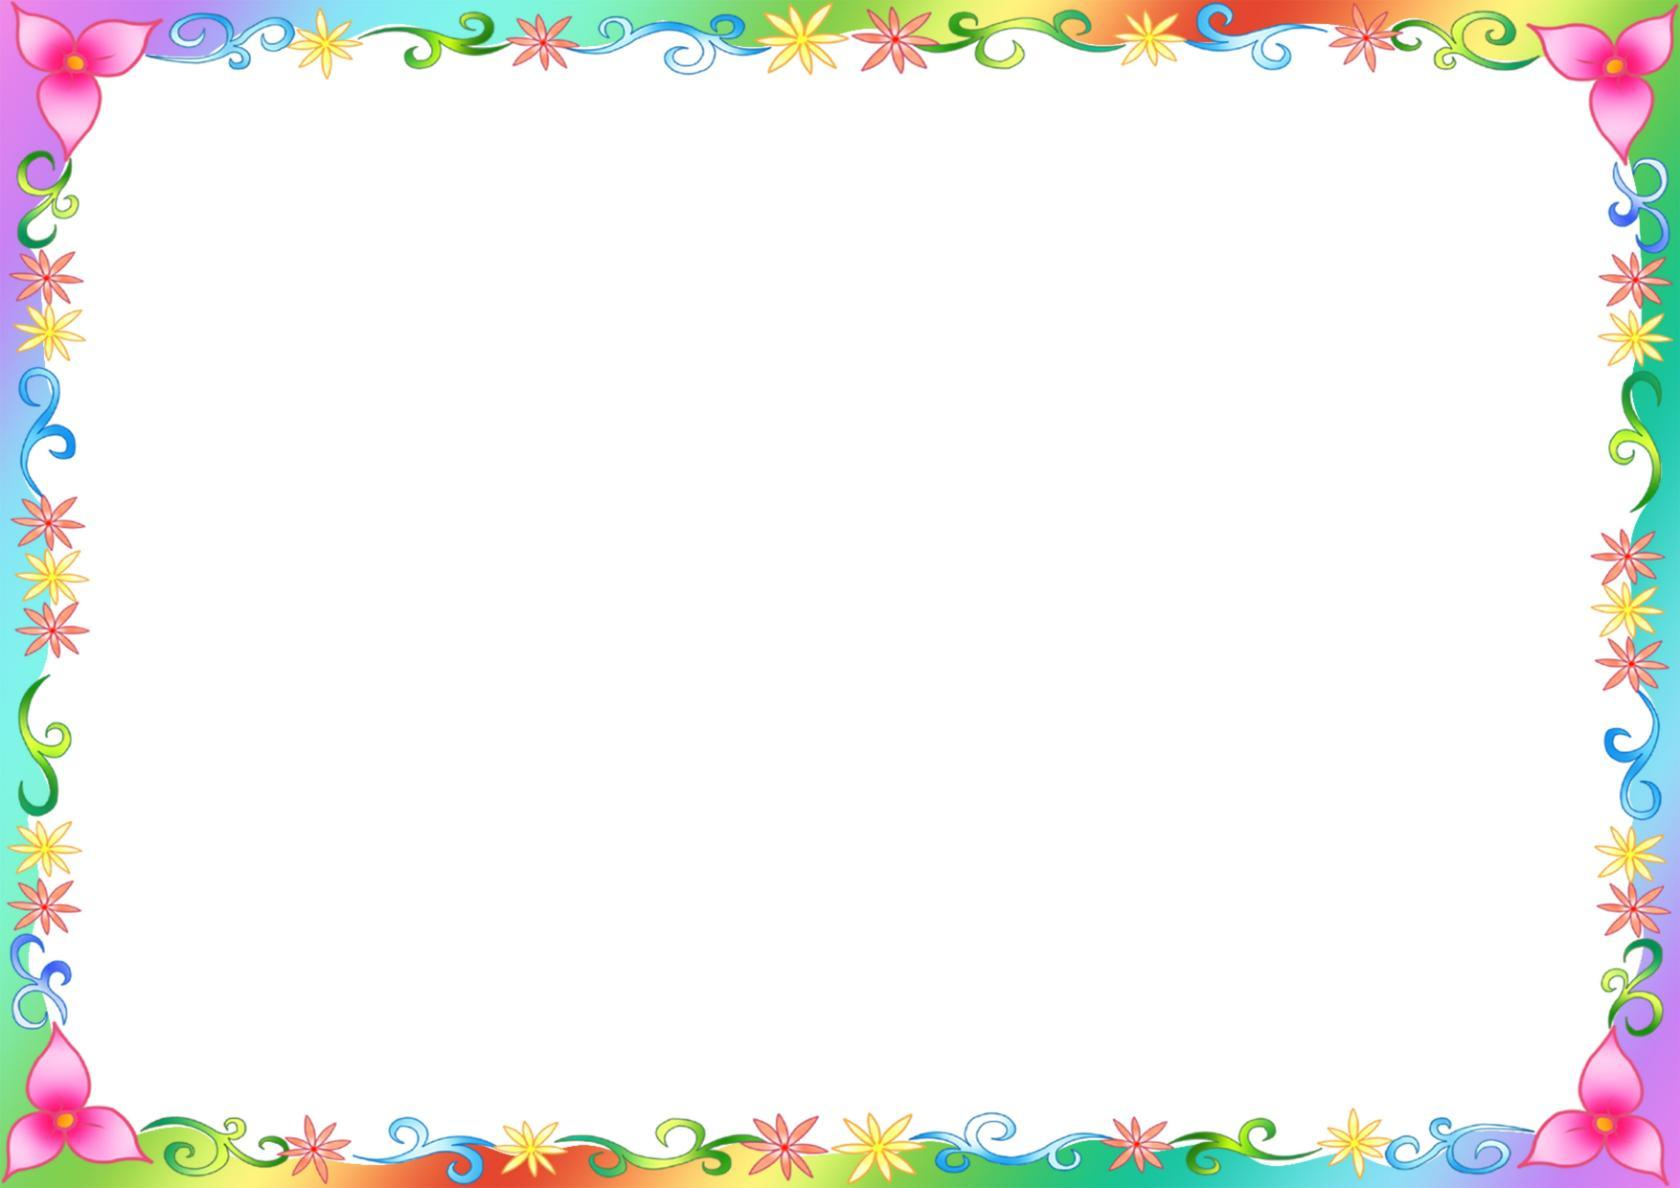 hello_html_104a51c7.jpg